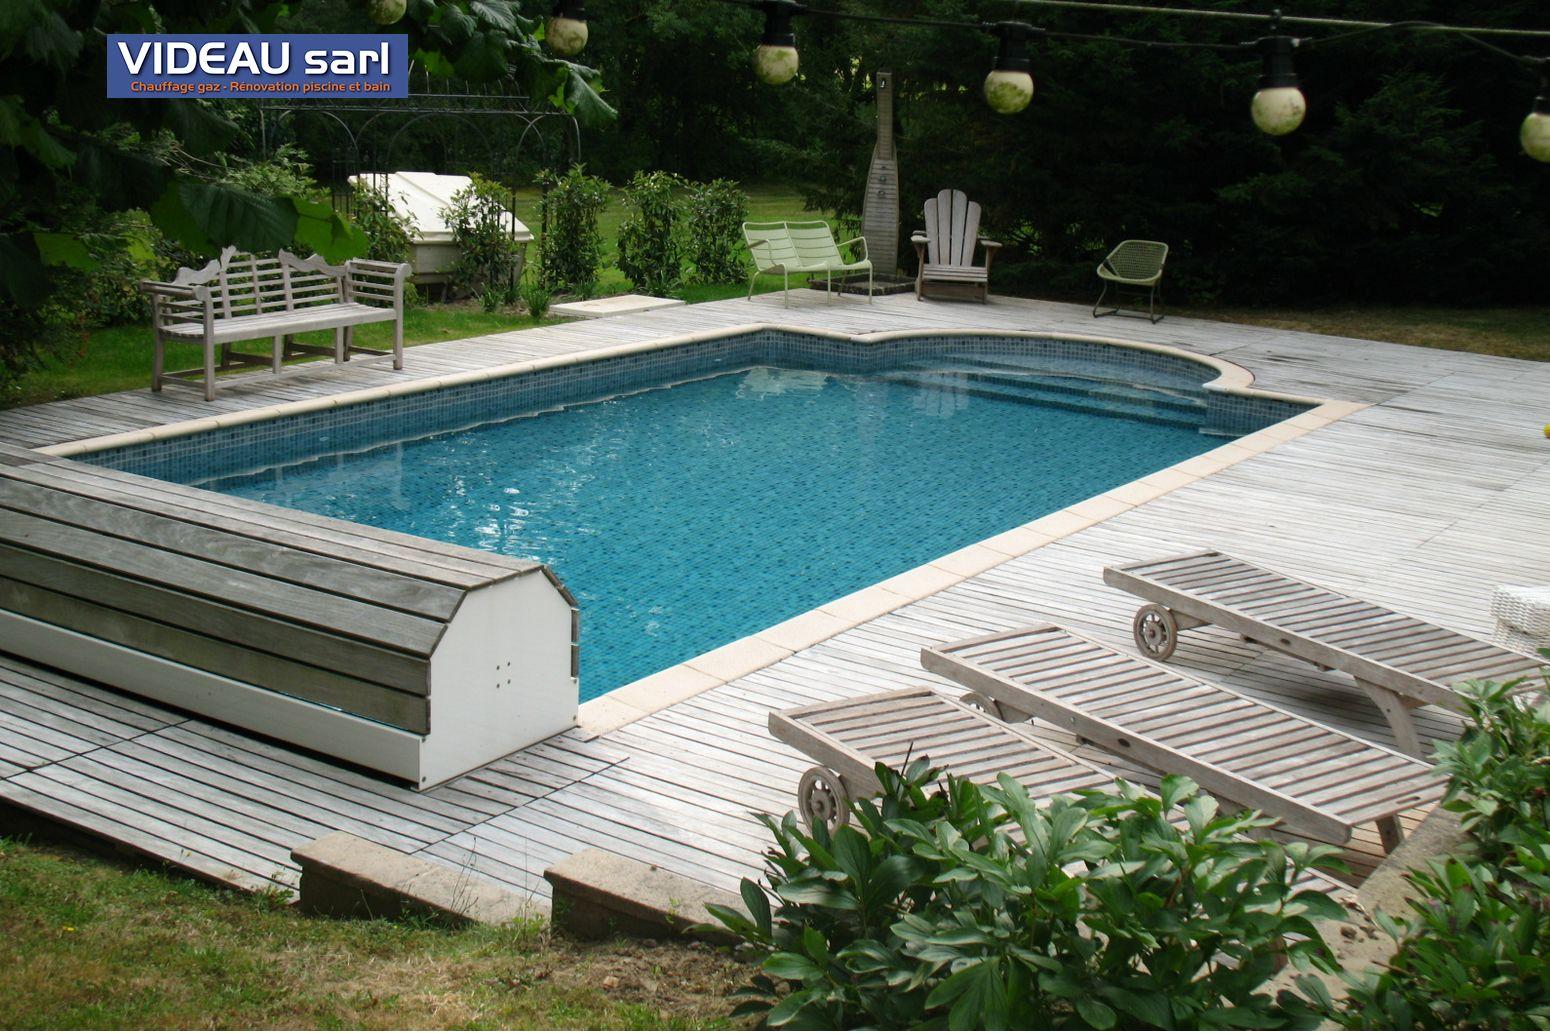 Piscine vendee entretien renovation videau for Entretien piscine